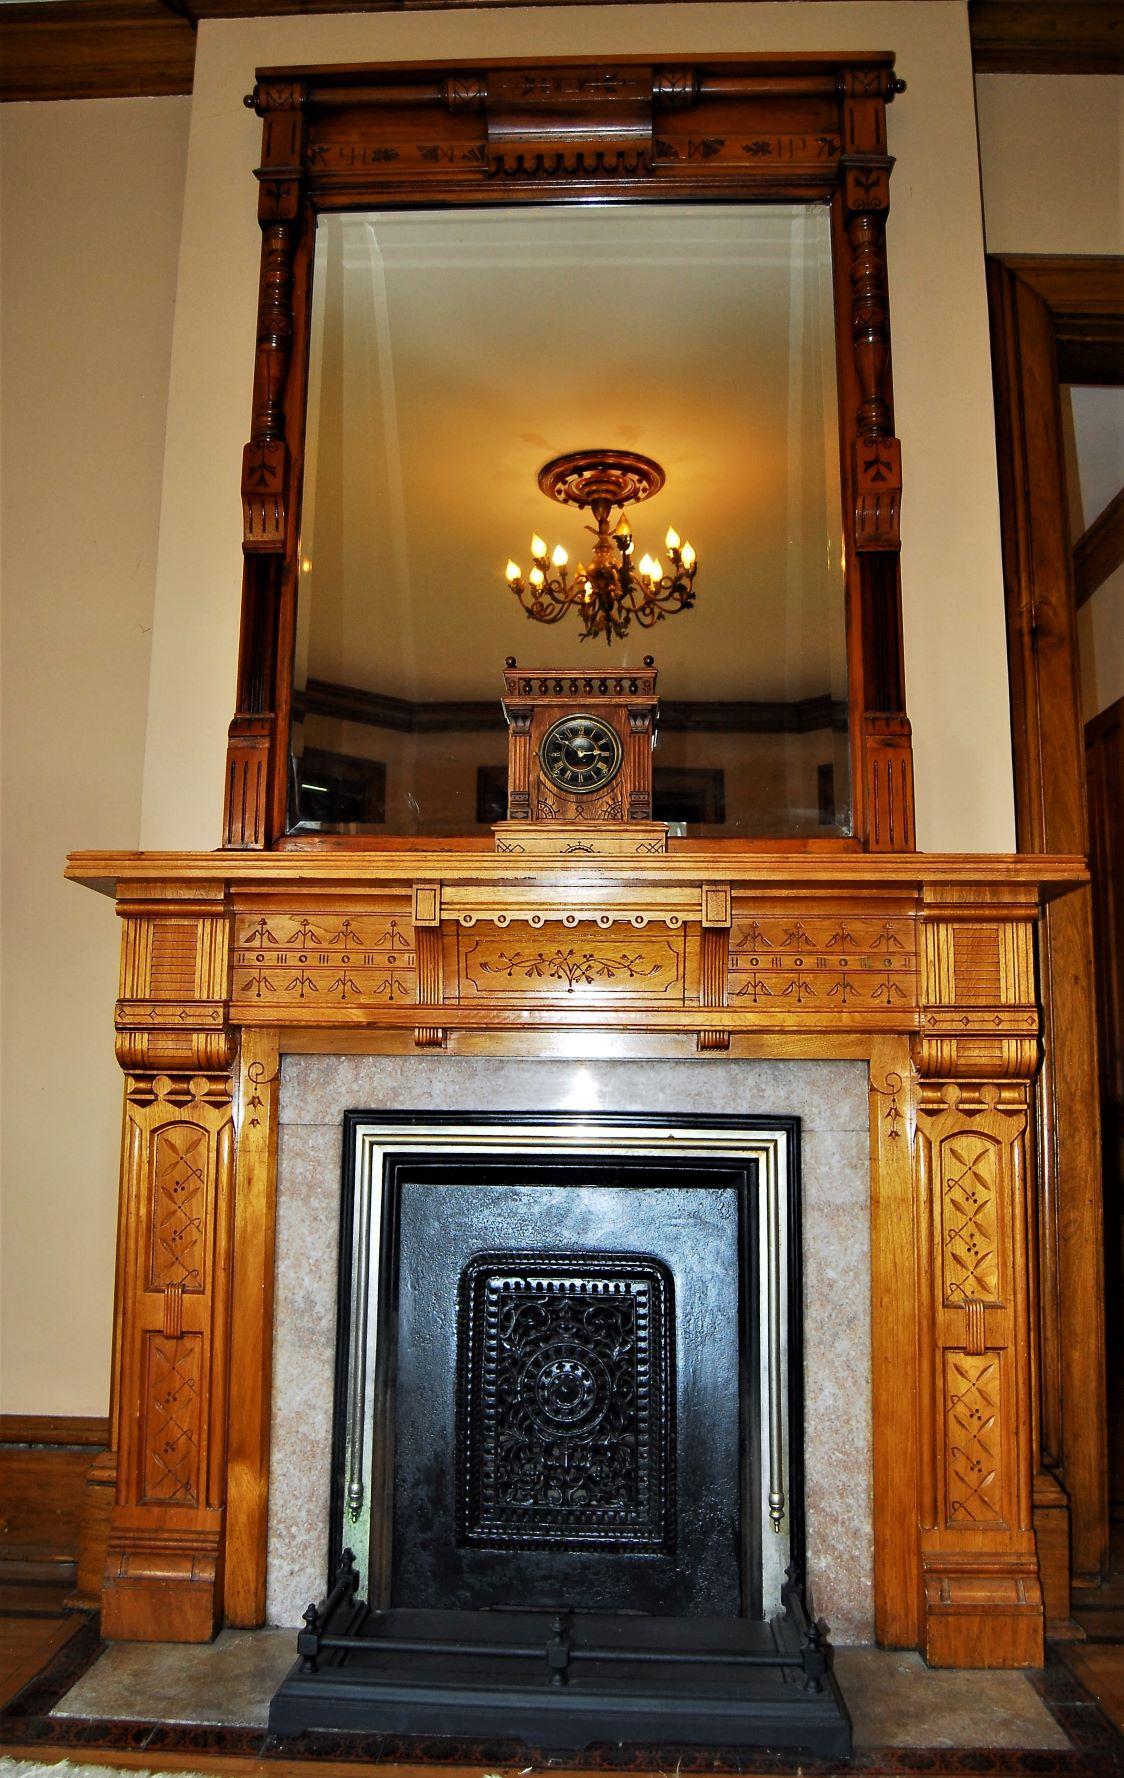 Butternut Fireplace & Mirror